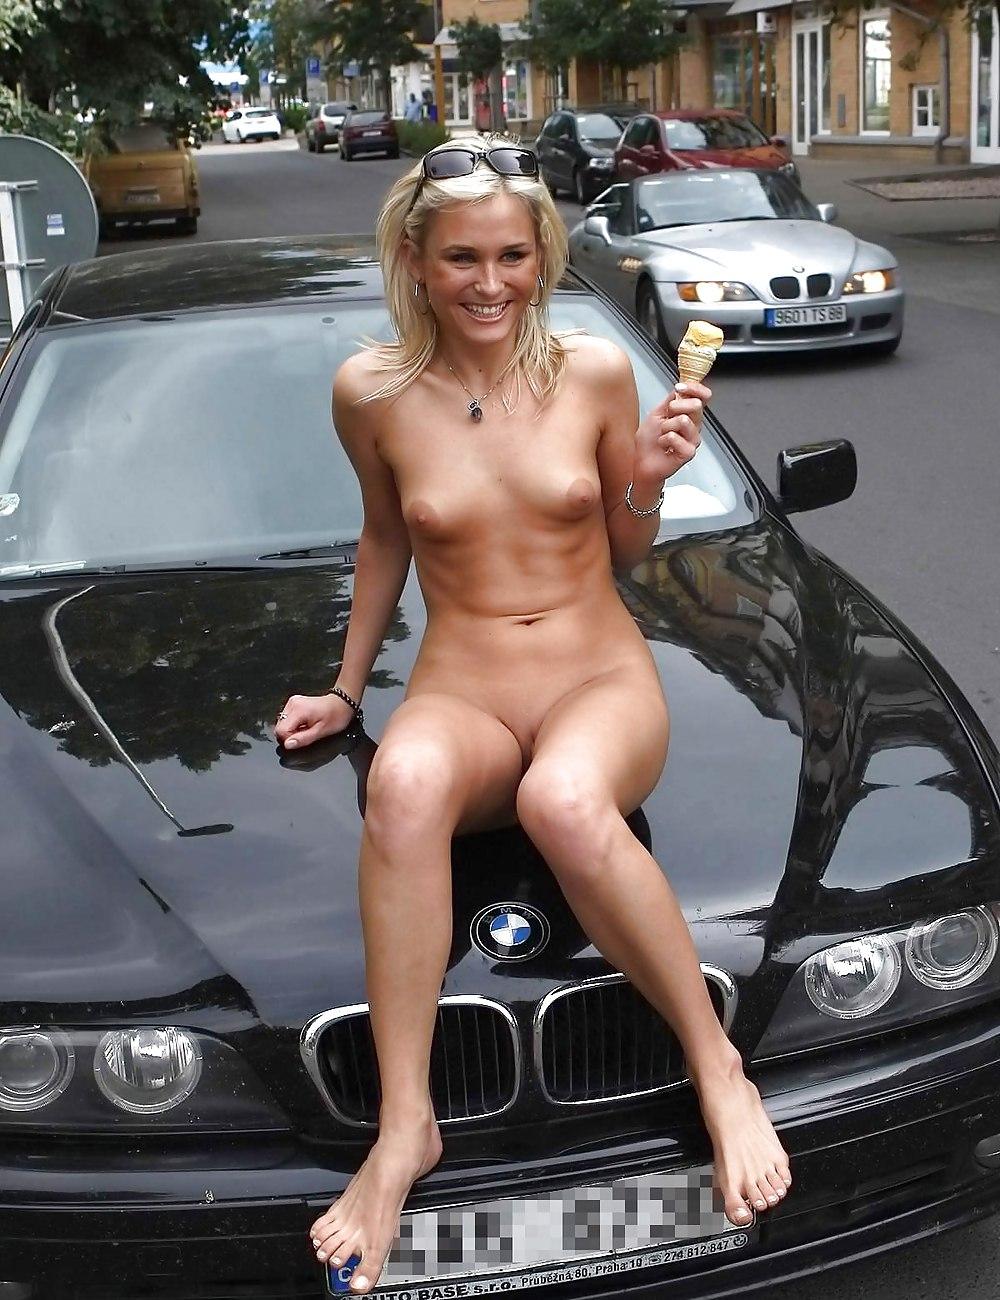 Girls flash chicks nude sexy amazon